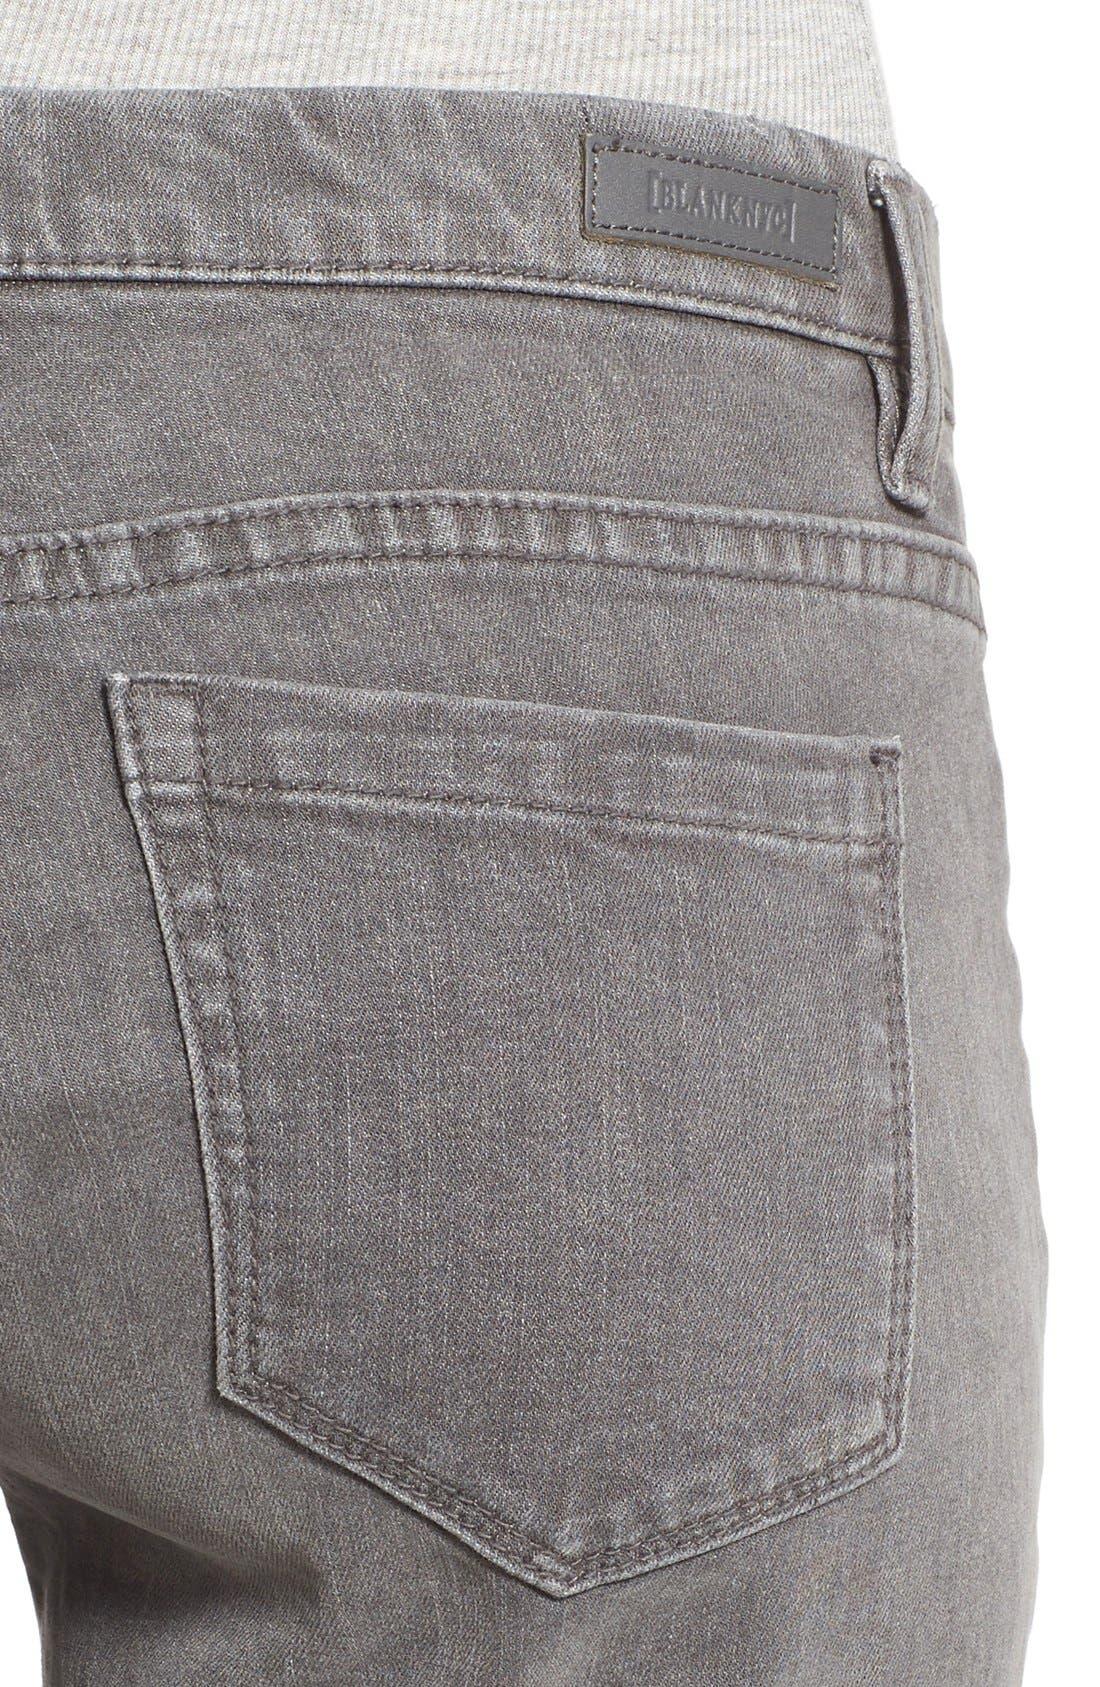 Alternate Image 4  - BLANKNYC Skinny Jeans (Fifty Shades)